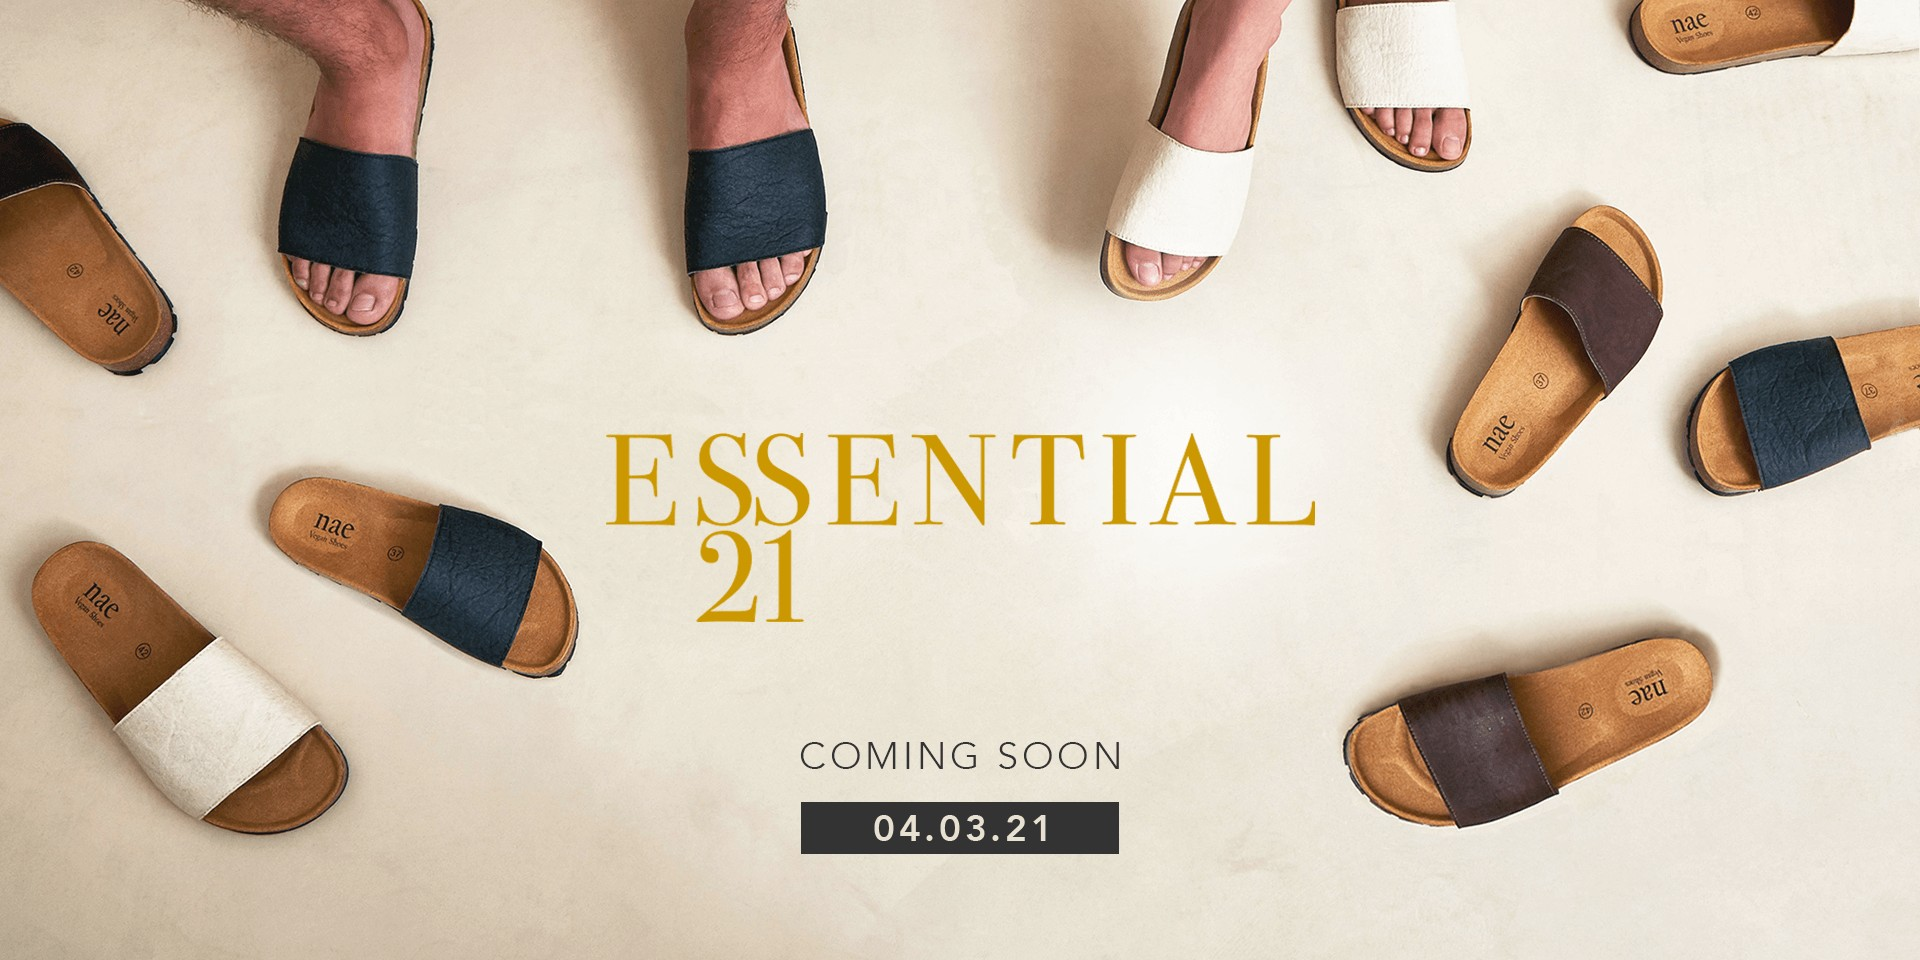 Vegan Shoes - Coming Soon